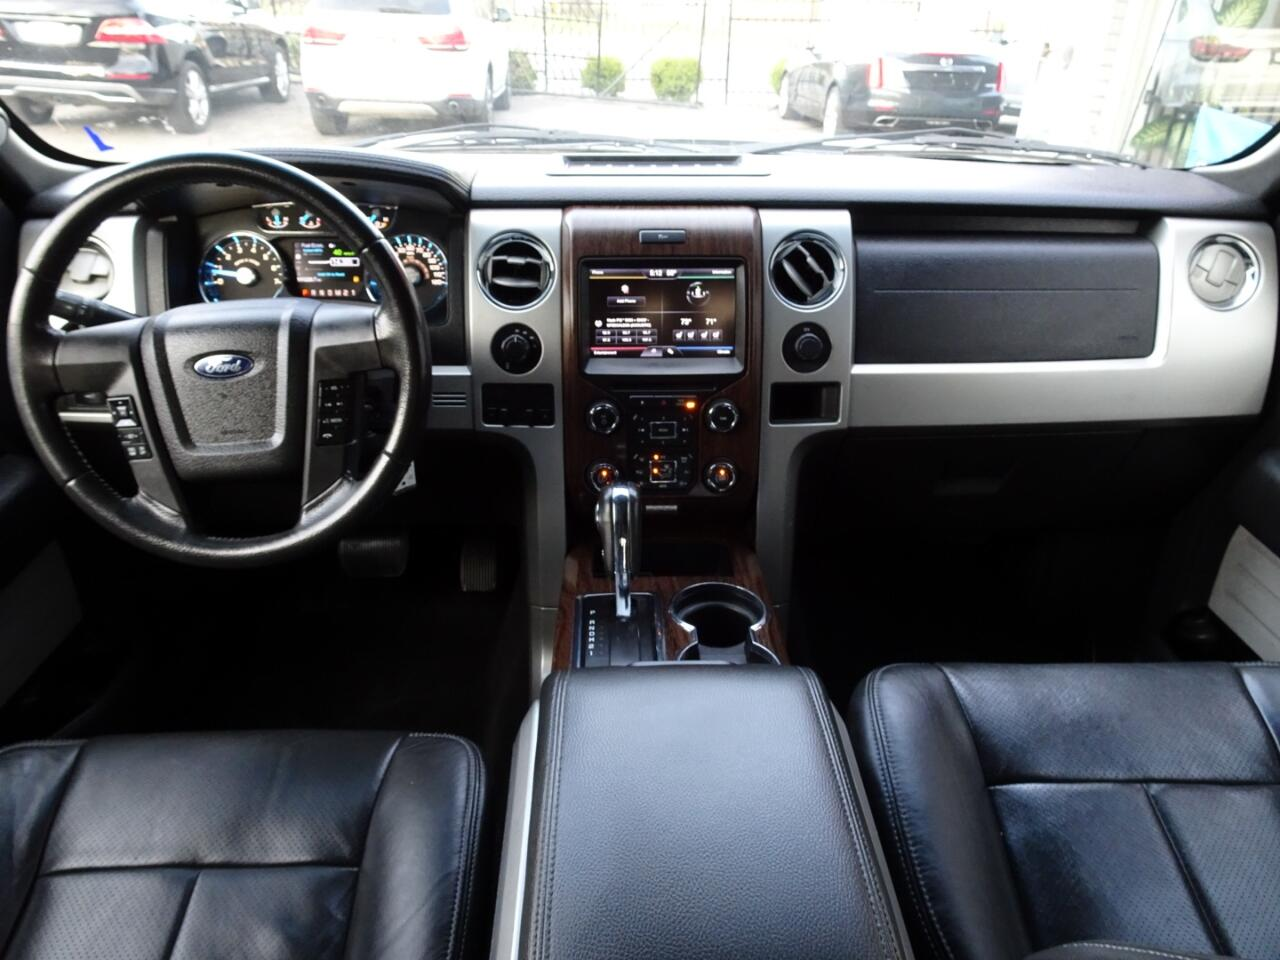 2013 Ford F-150 Lariat SuperCrew 4WD